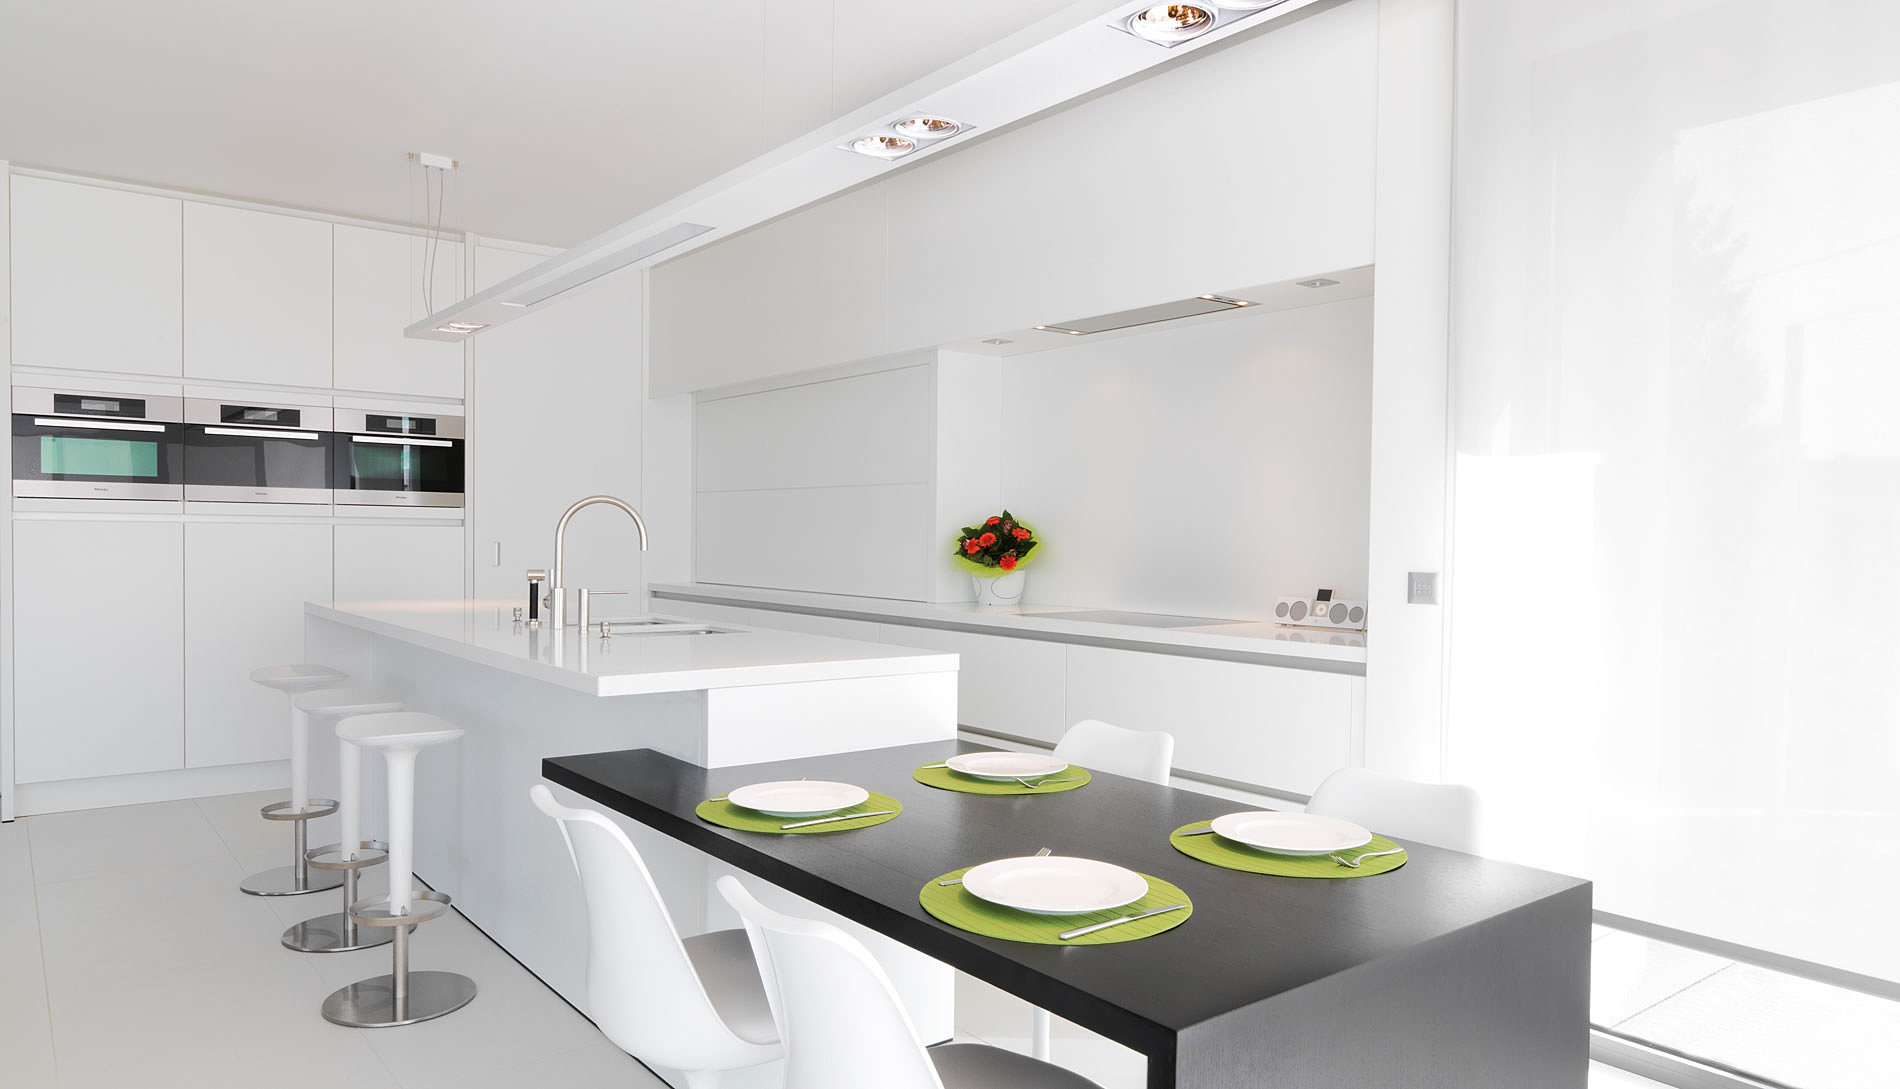 ... en interieur. MP BUYL - Gent en omgeving  Moderne keukens regio Gent